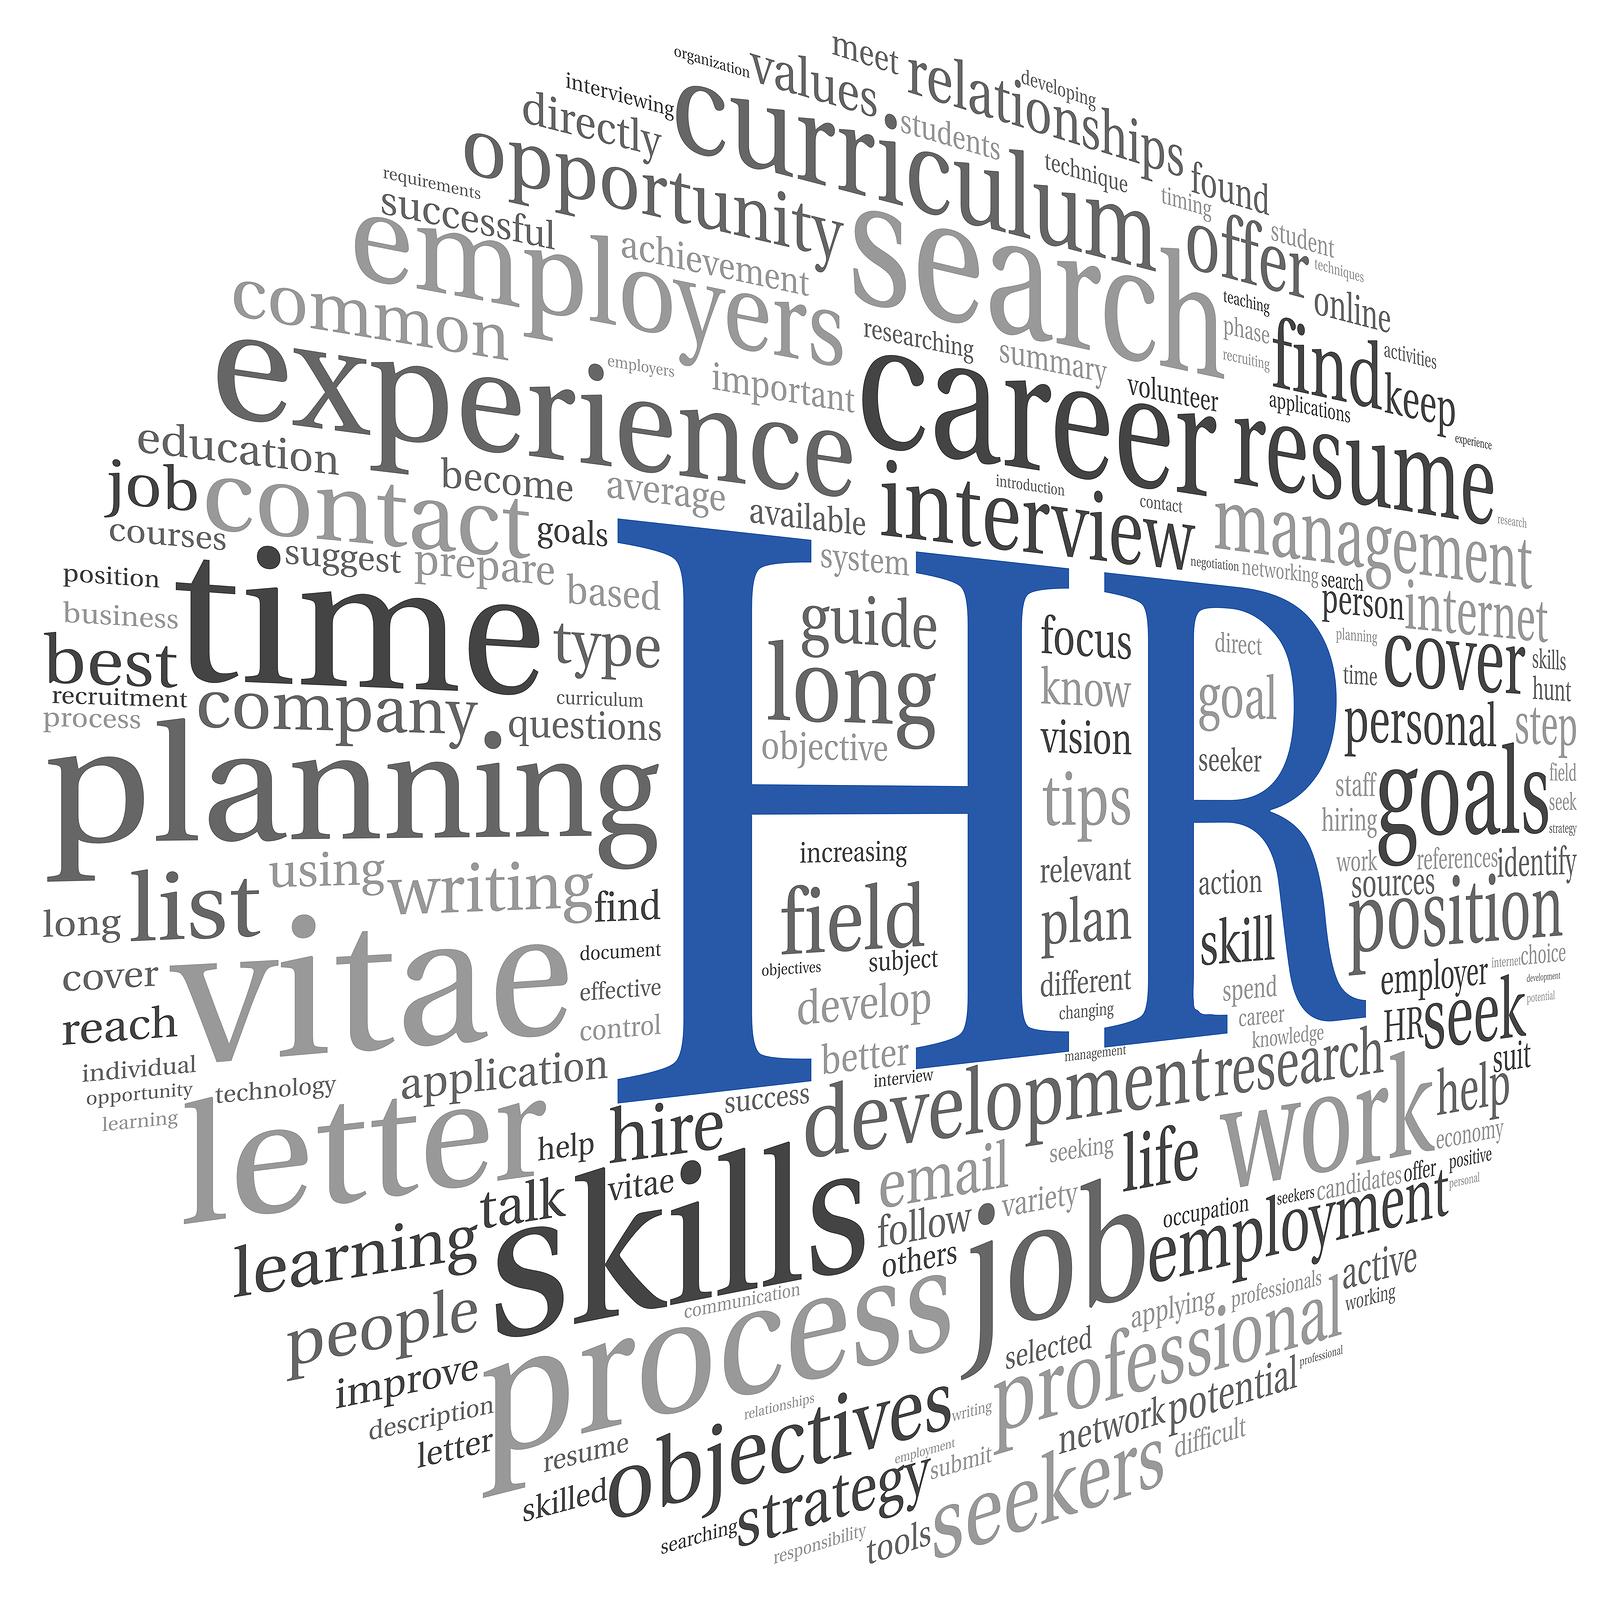 halliburton management planning essay